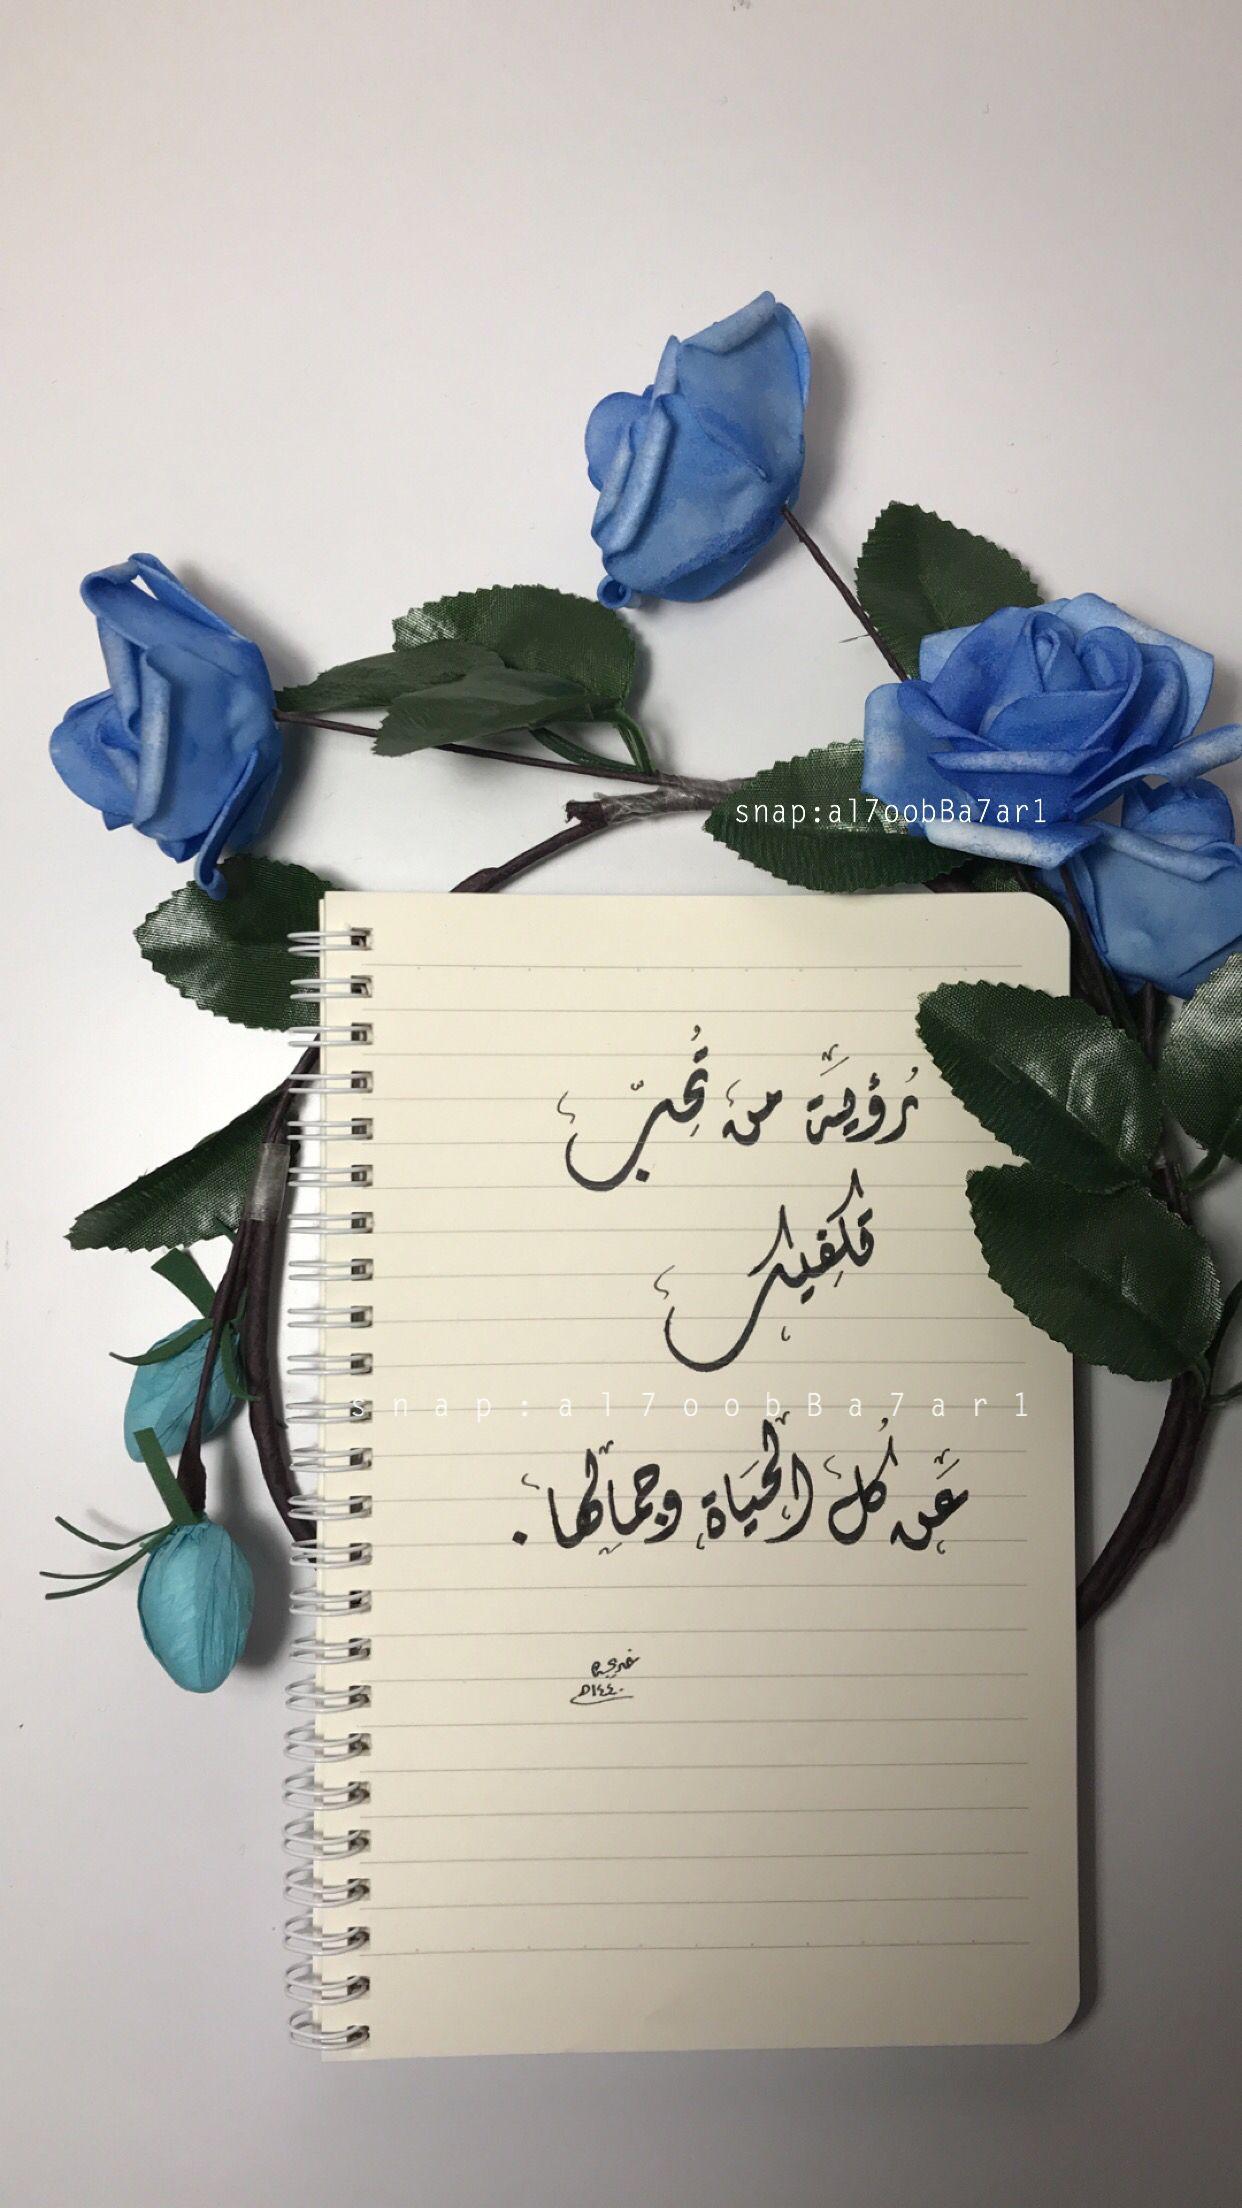 Pin By Baianhijab On إقتباسات أعجبتني Arabic Words Words Arabic Quotes